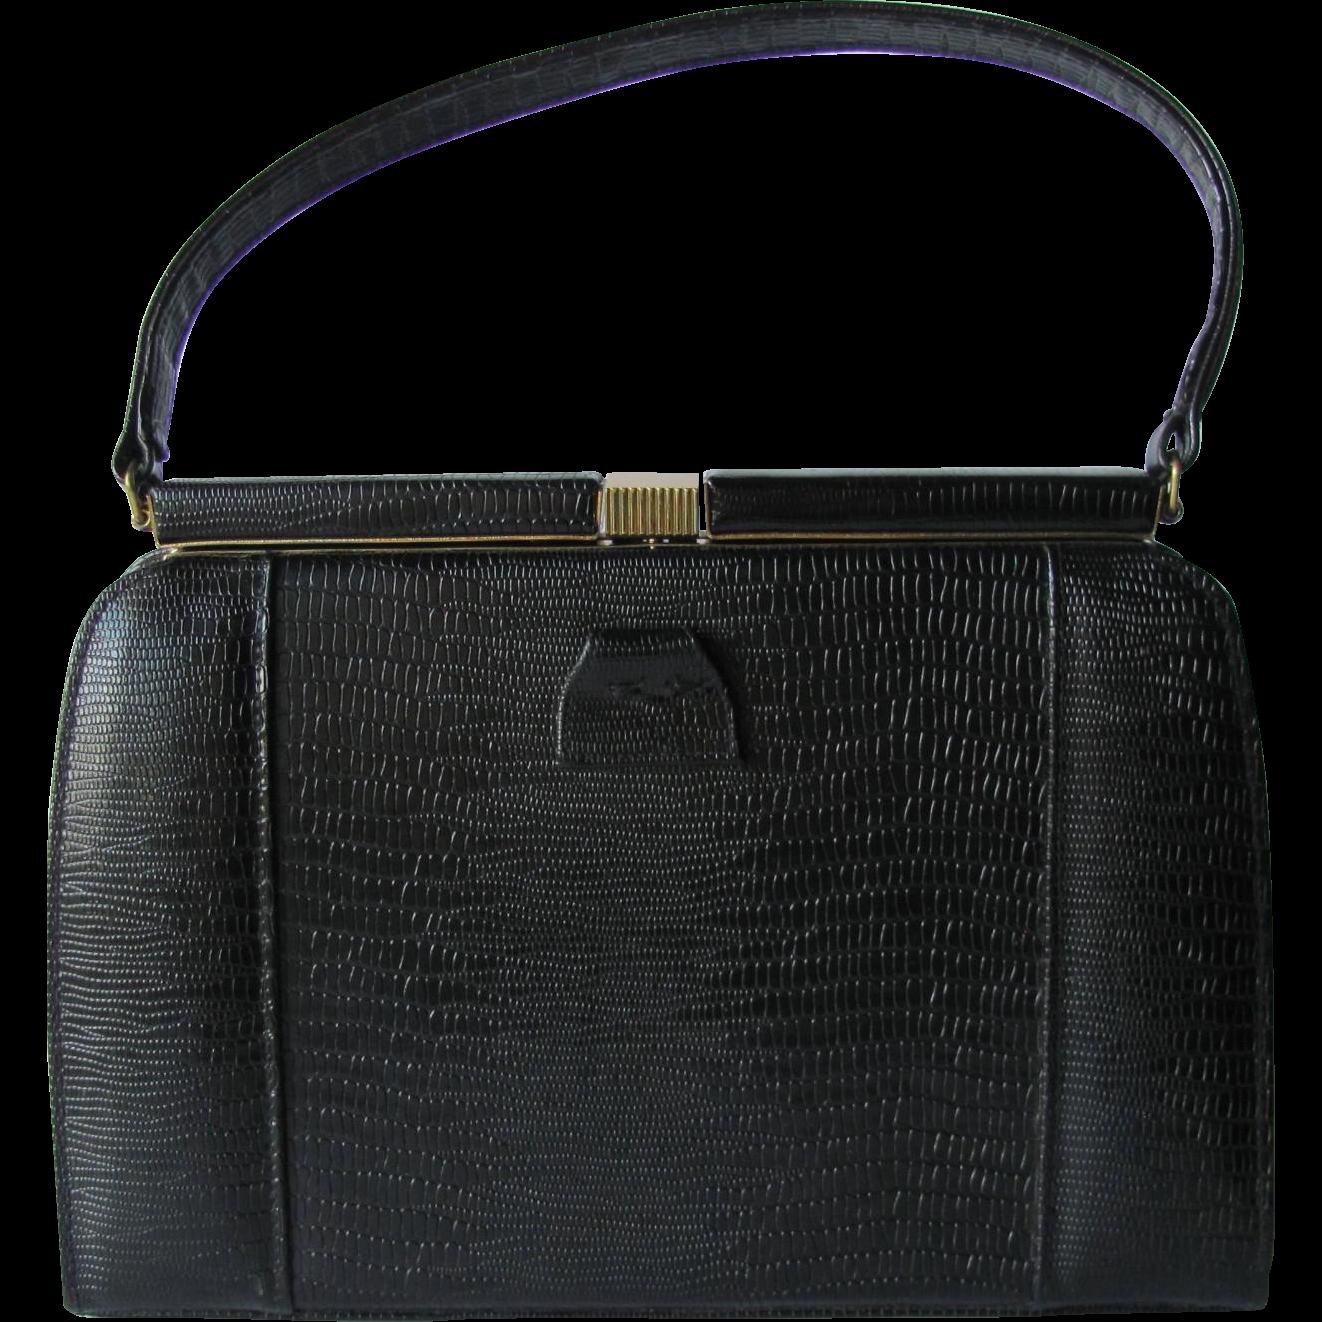 Vintage Mid-Century Black Kelly Handbag of Embossed Faux Reptile